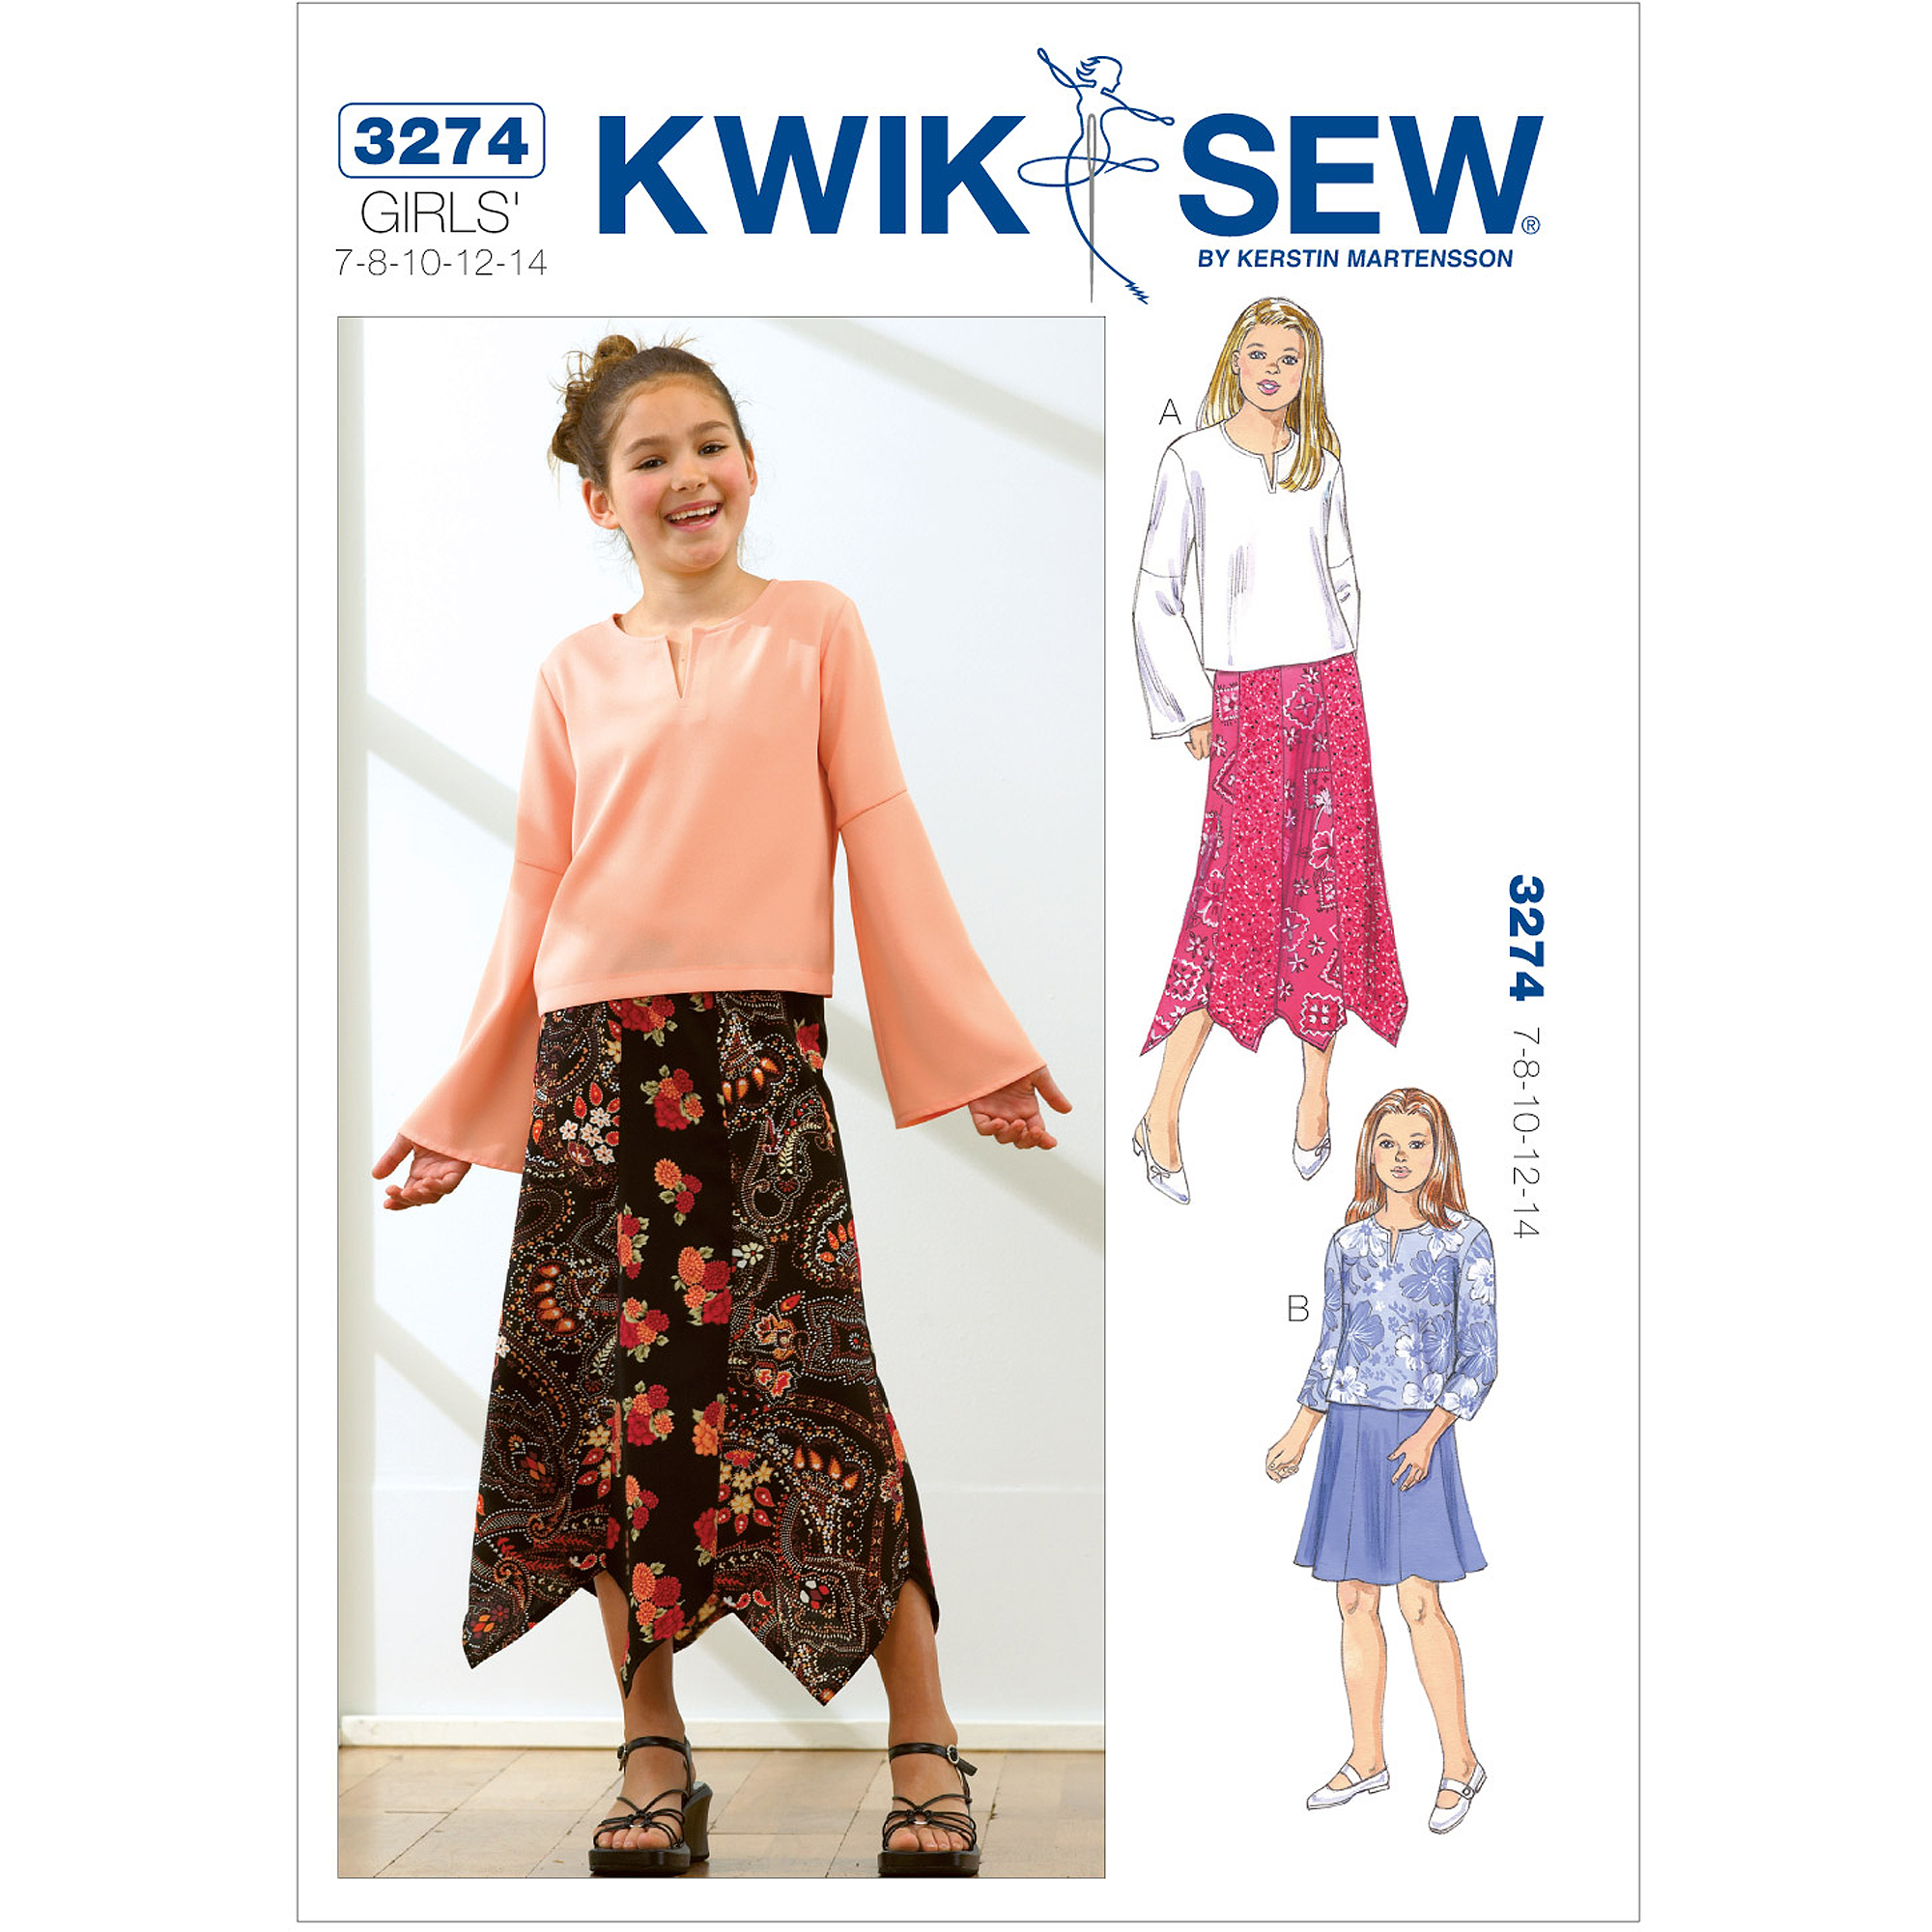 Kwik Sew Pattern Tops and Skirts, (7, 8, 10, 12, 14)